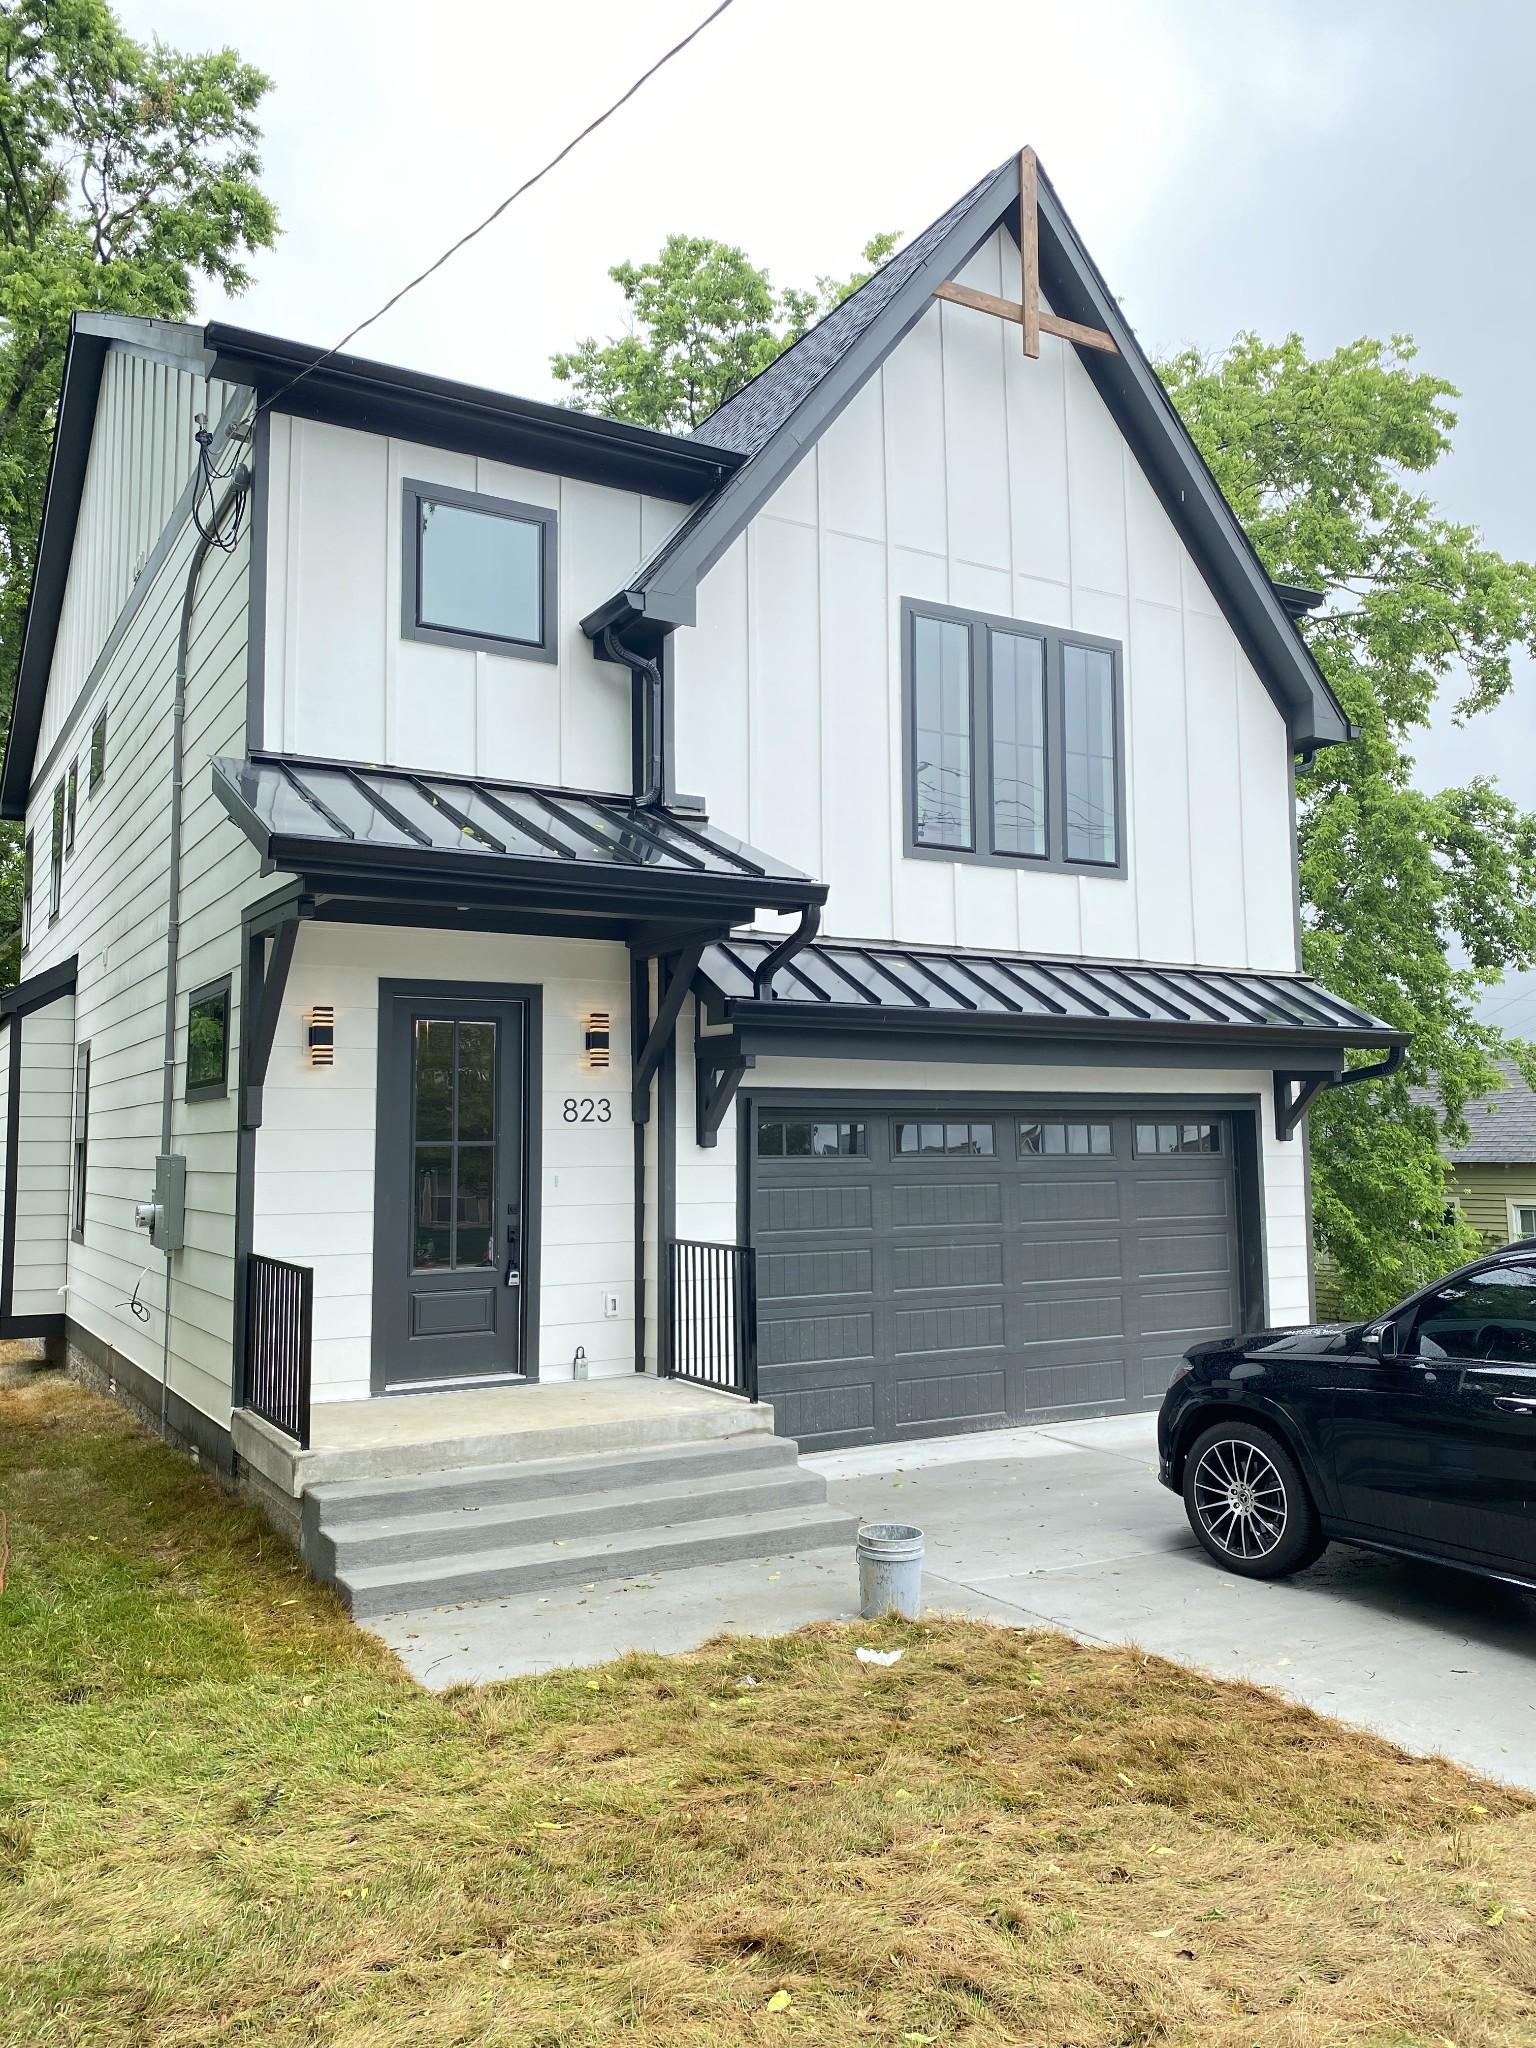 823 40th Ave N Property Photo - Nashville, TN real estate listing